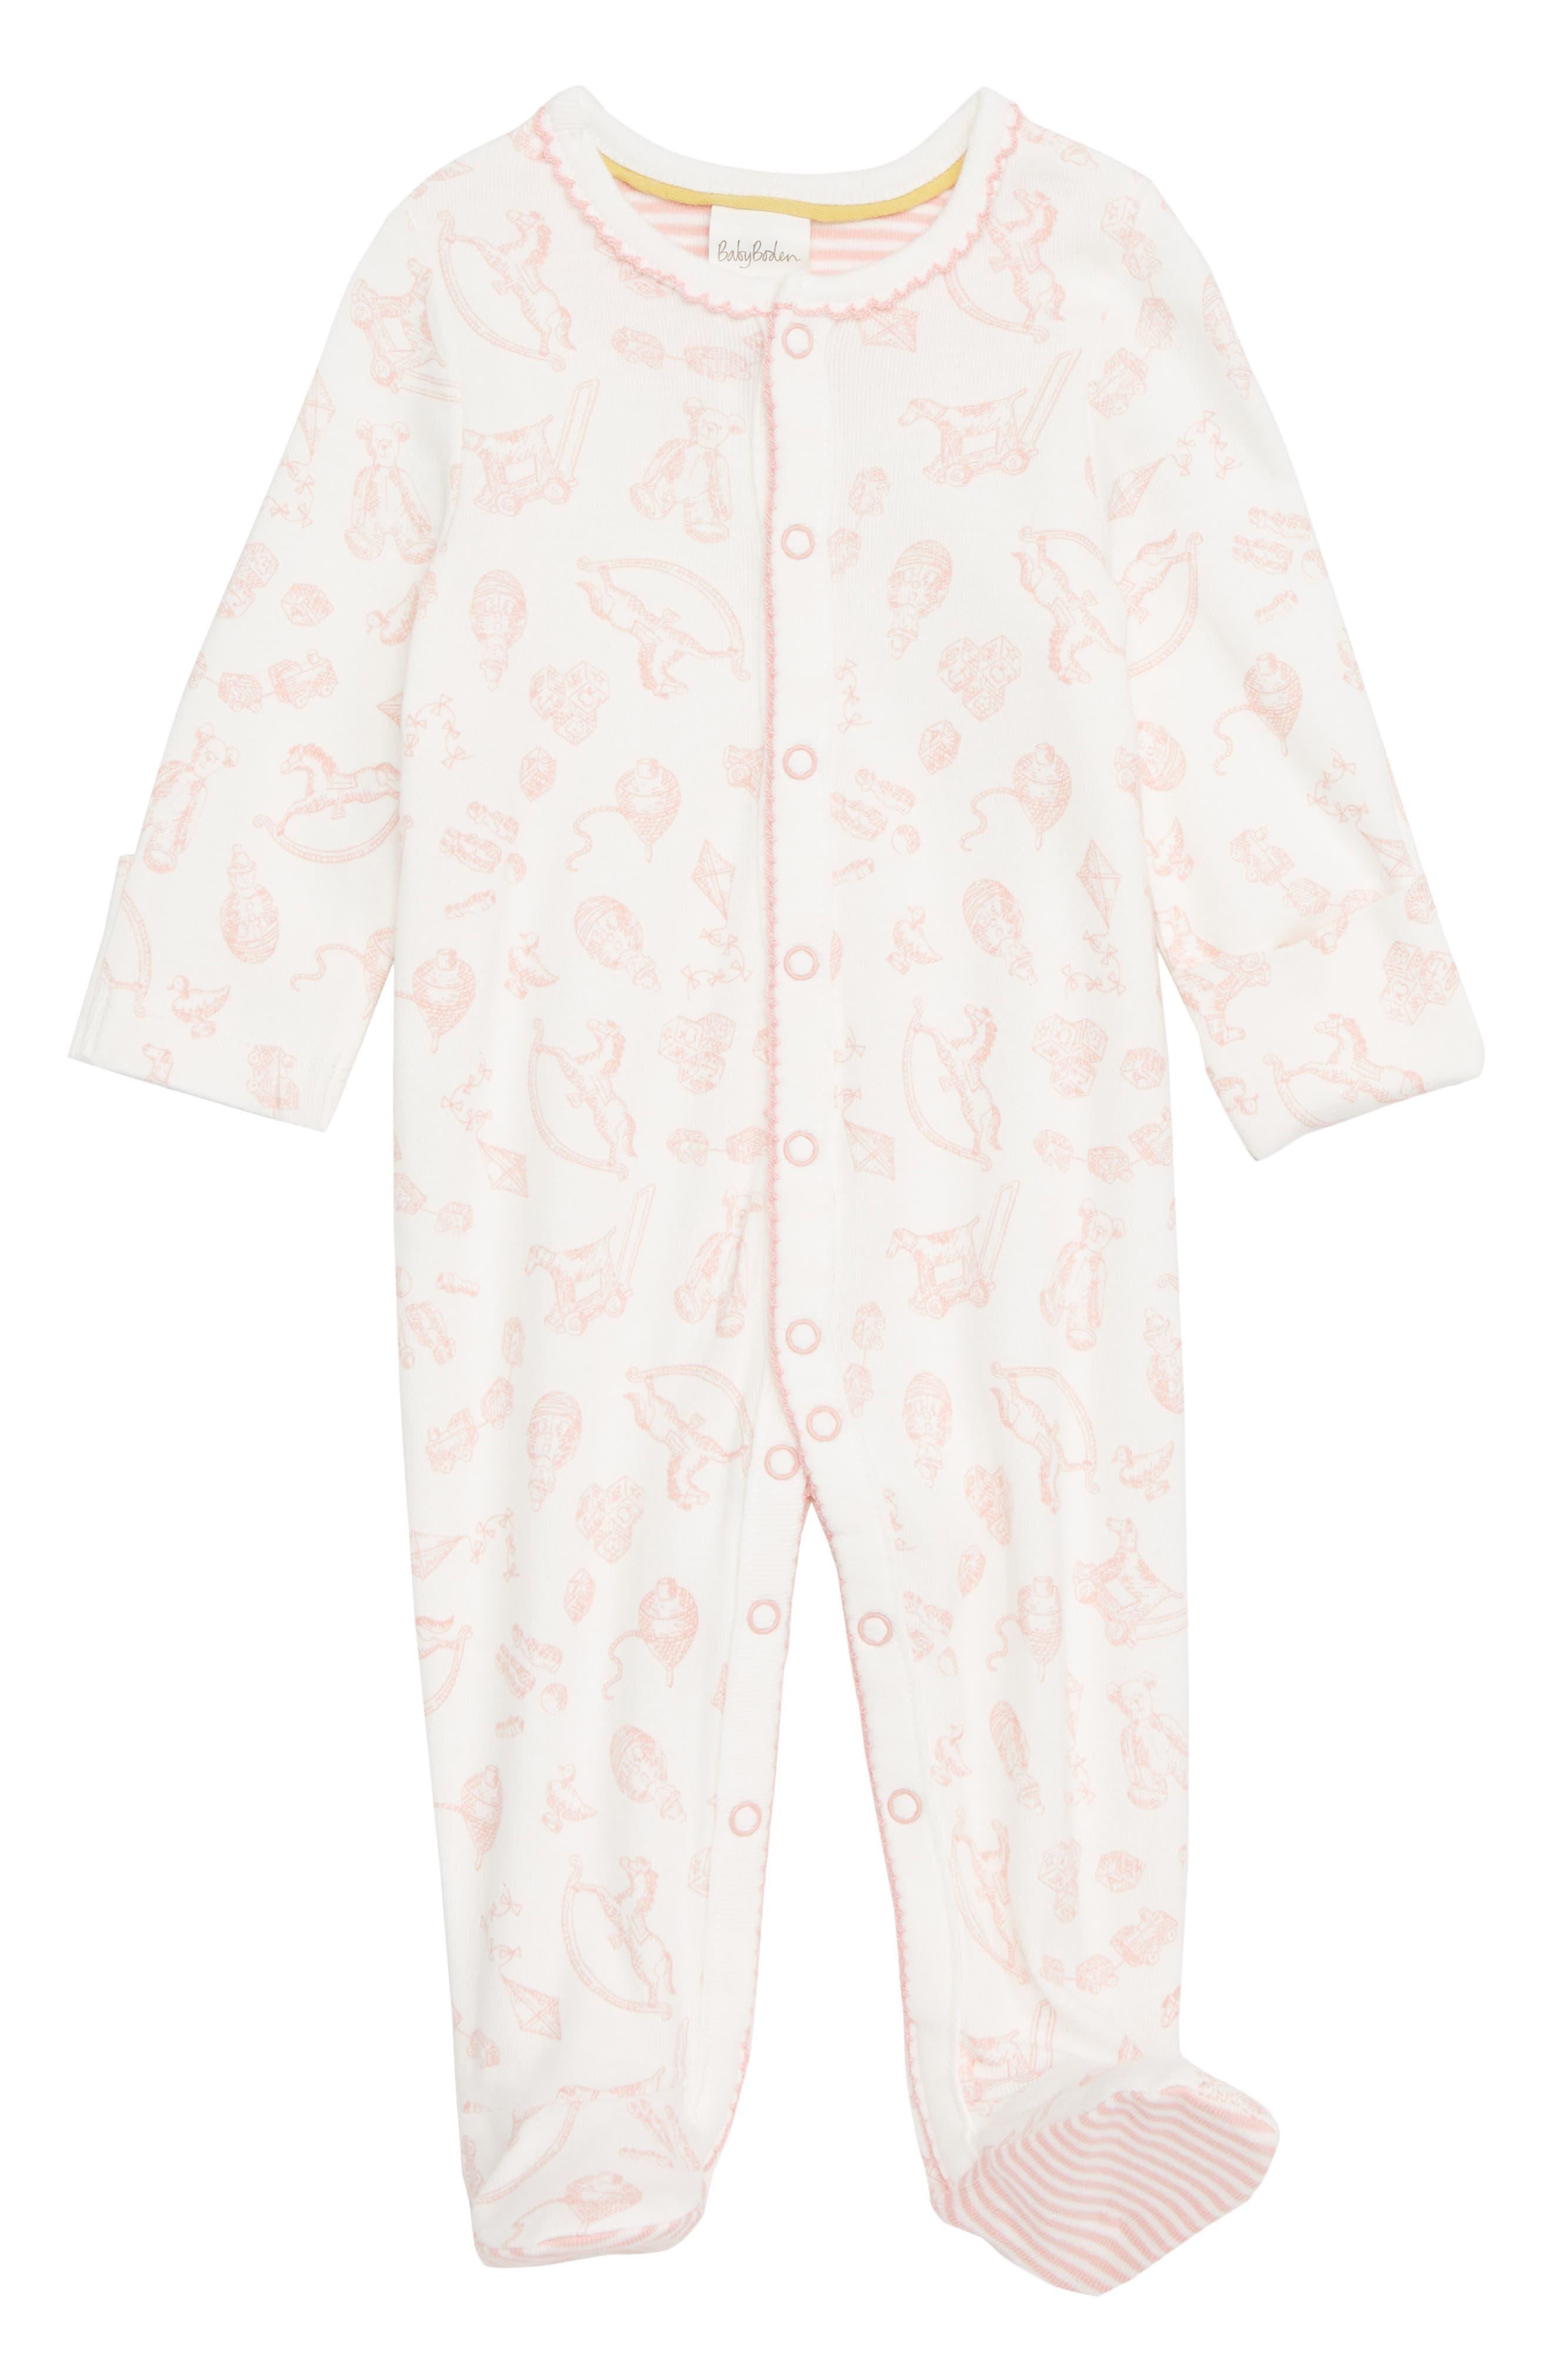 Organic Cotton One-Piece Pajamas,                             Main thumbnail 1, color,                             684